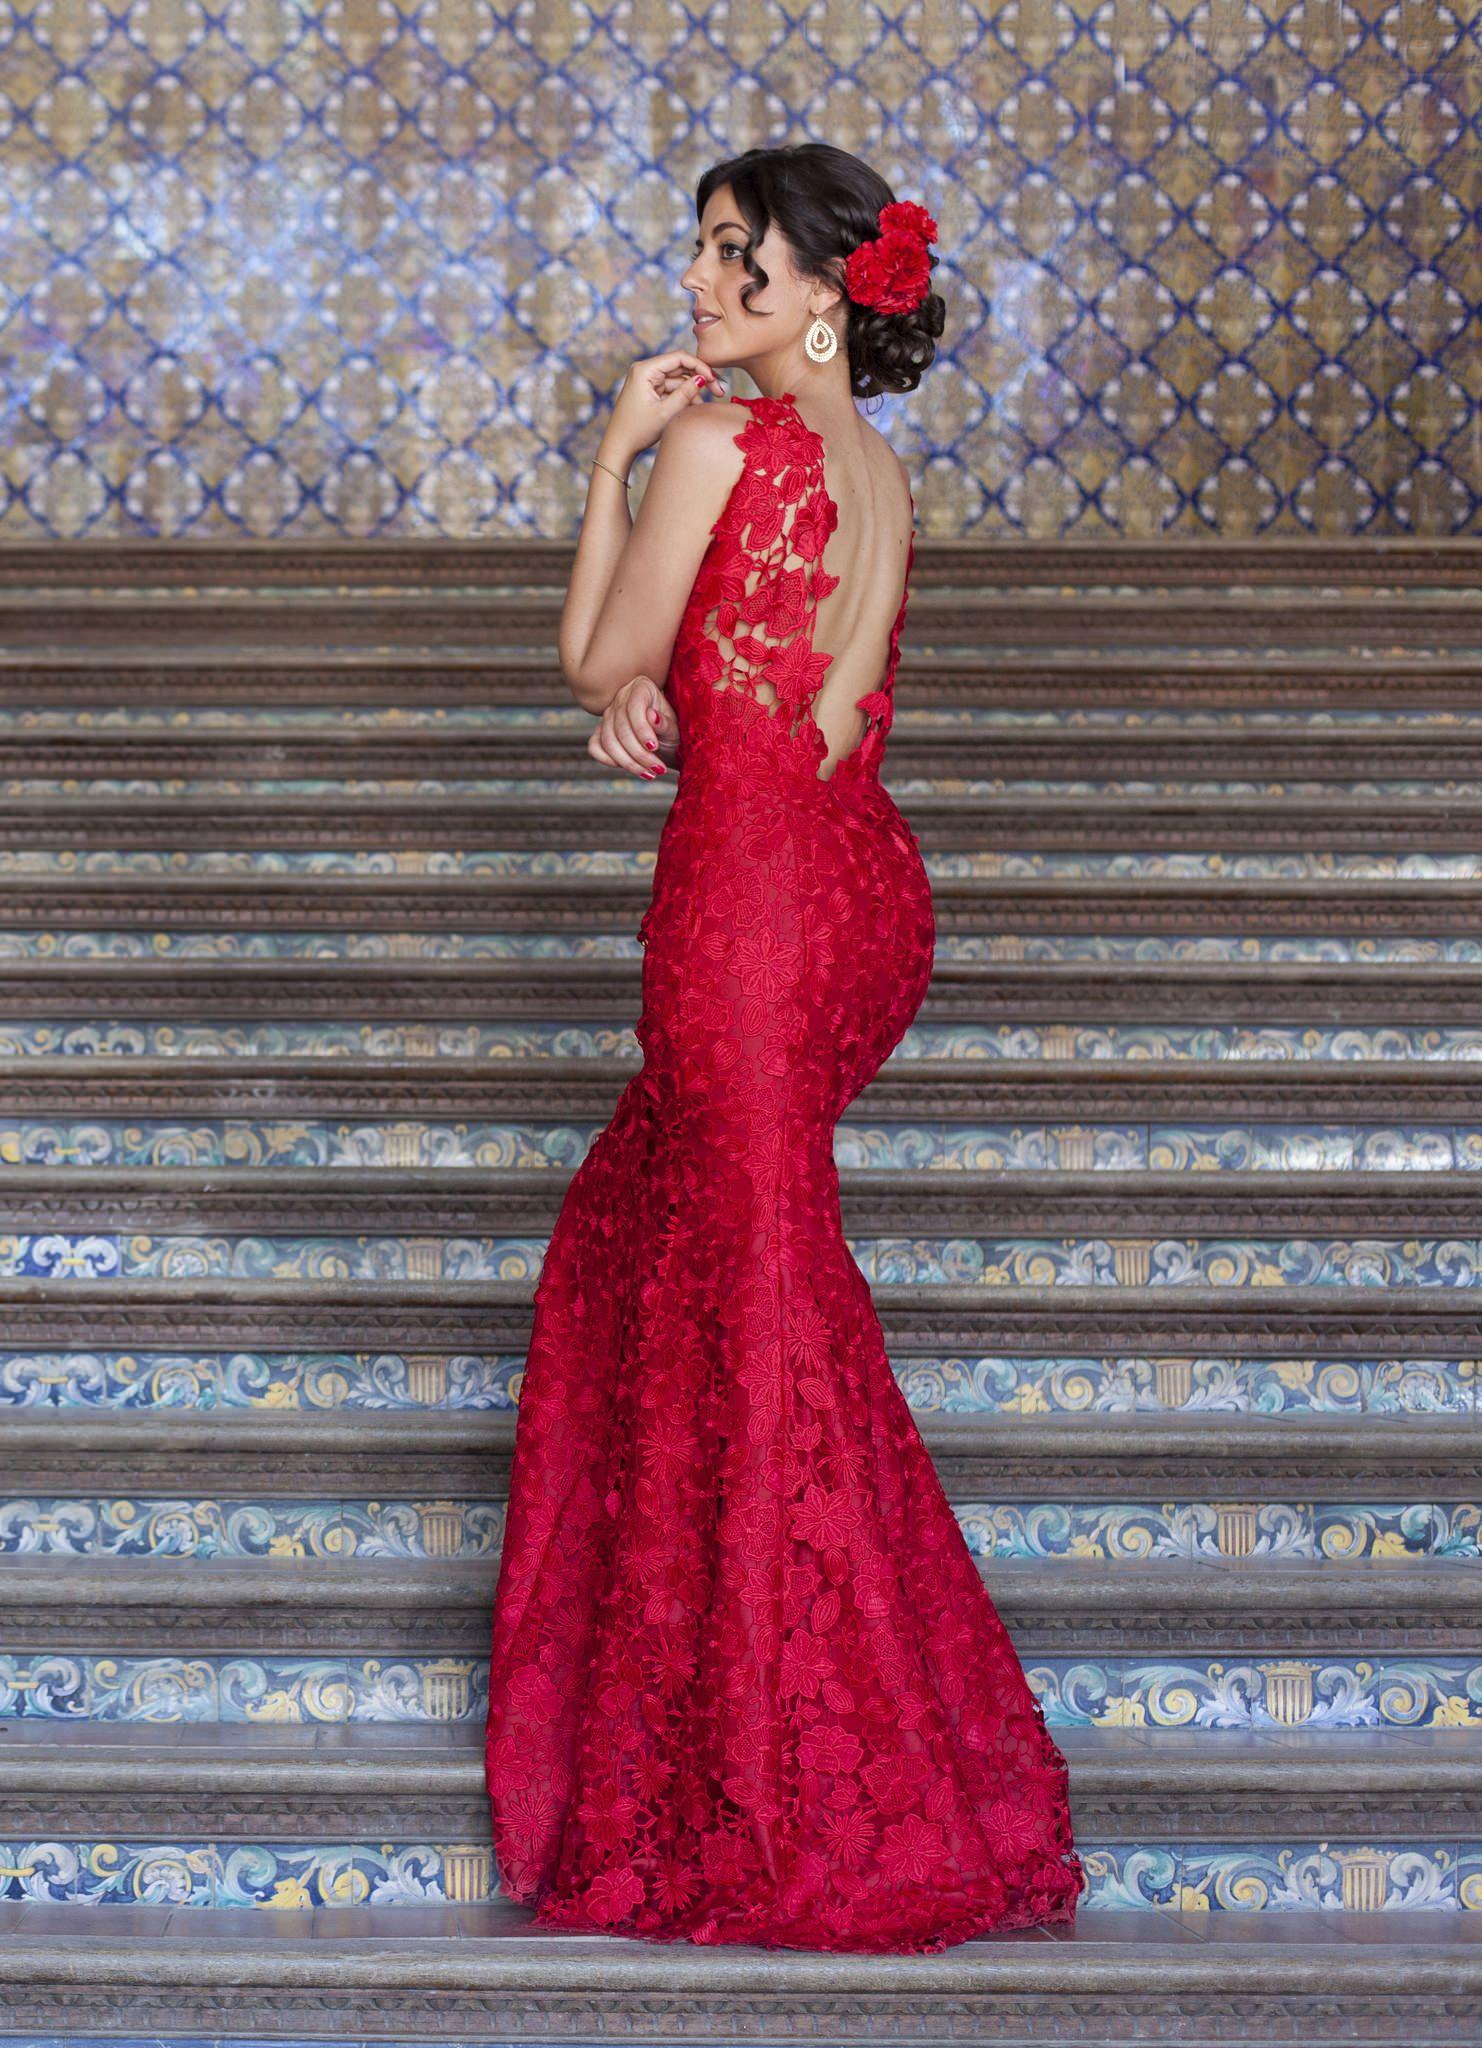 Mg copia vestidos de mujer pinterest flamenco classy